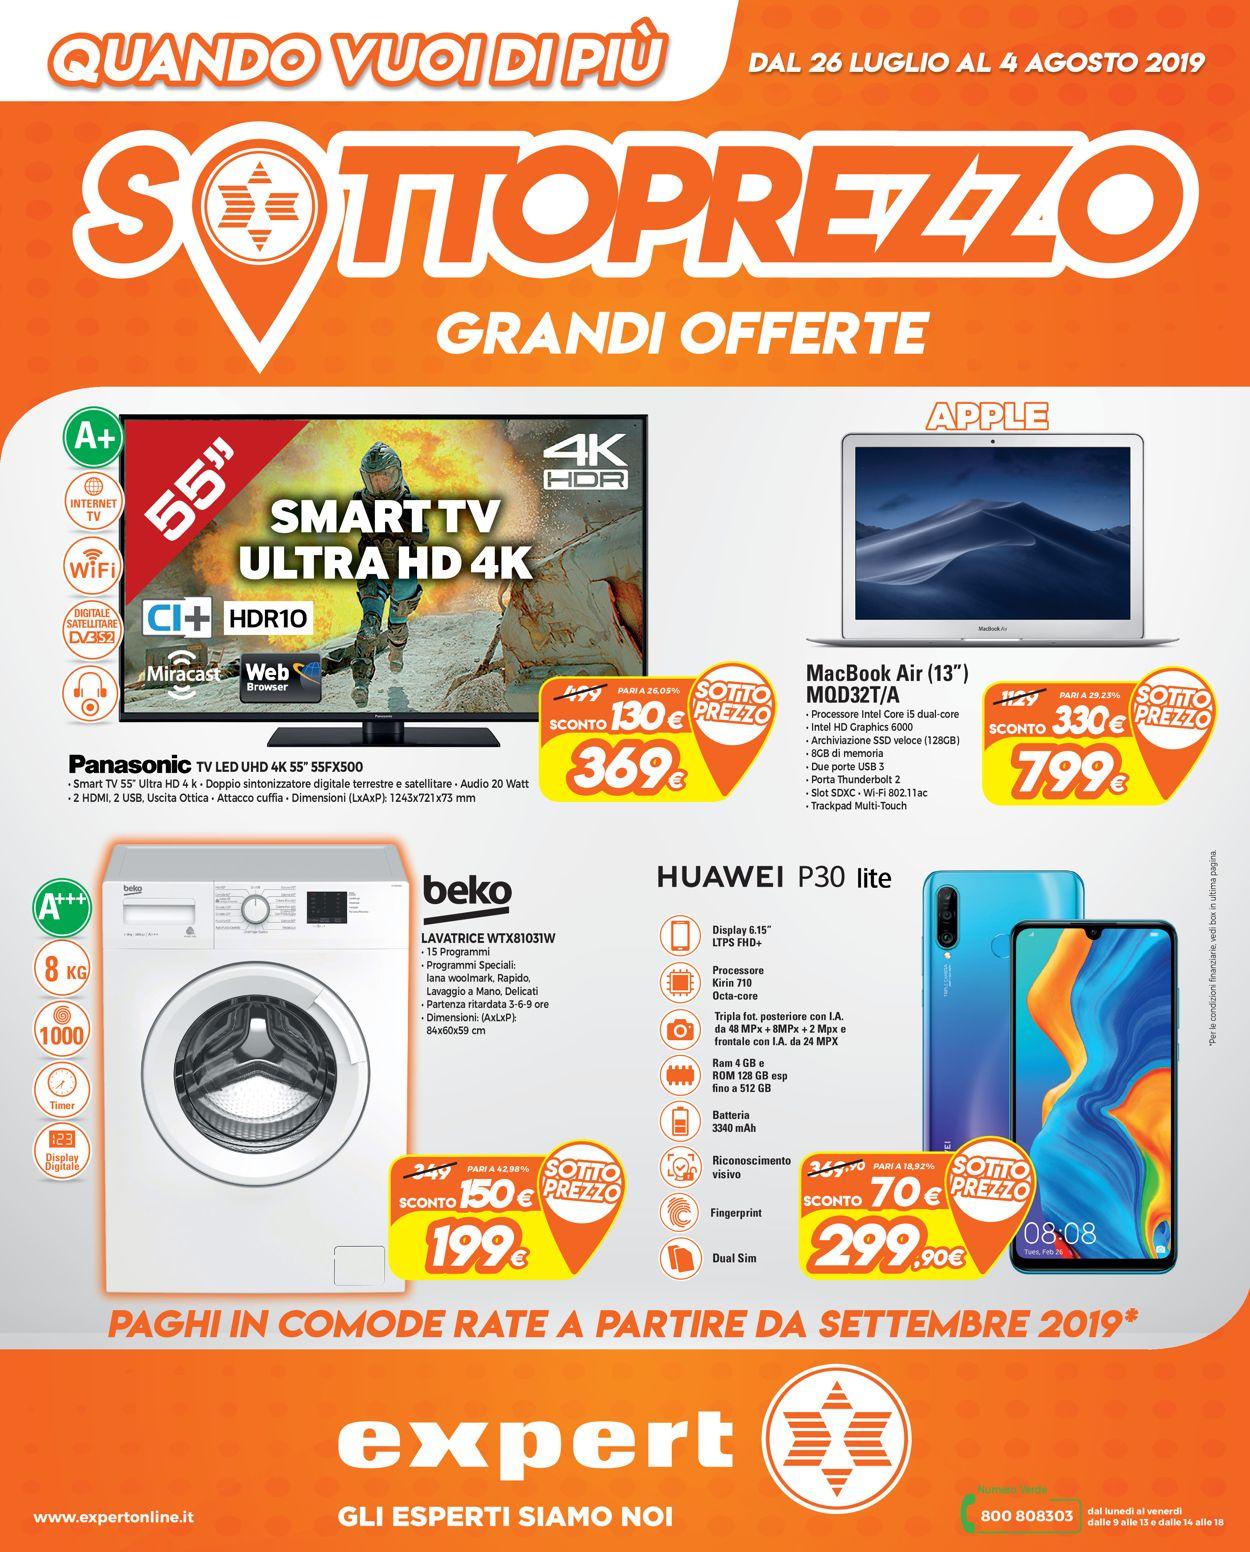 Volantino Iperal - Offerte 26/07-04/08/2019